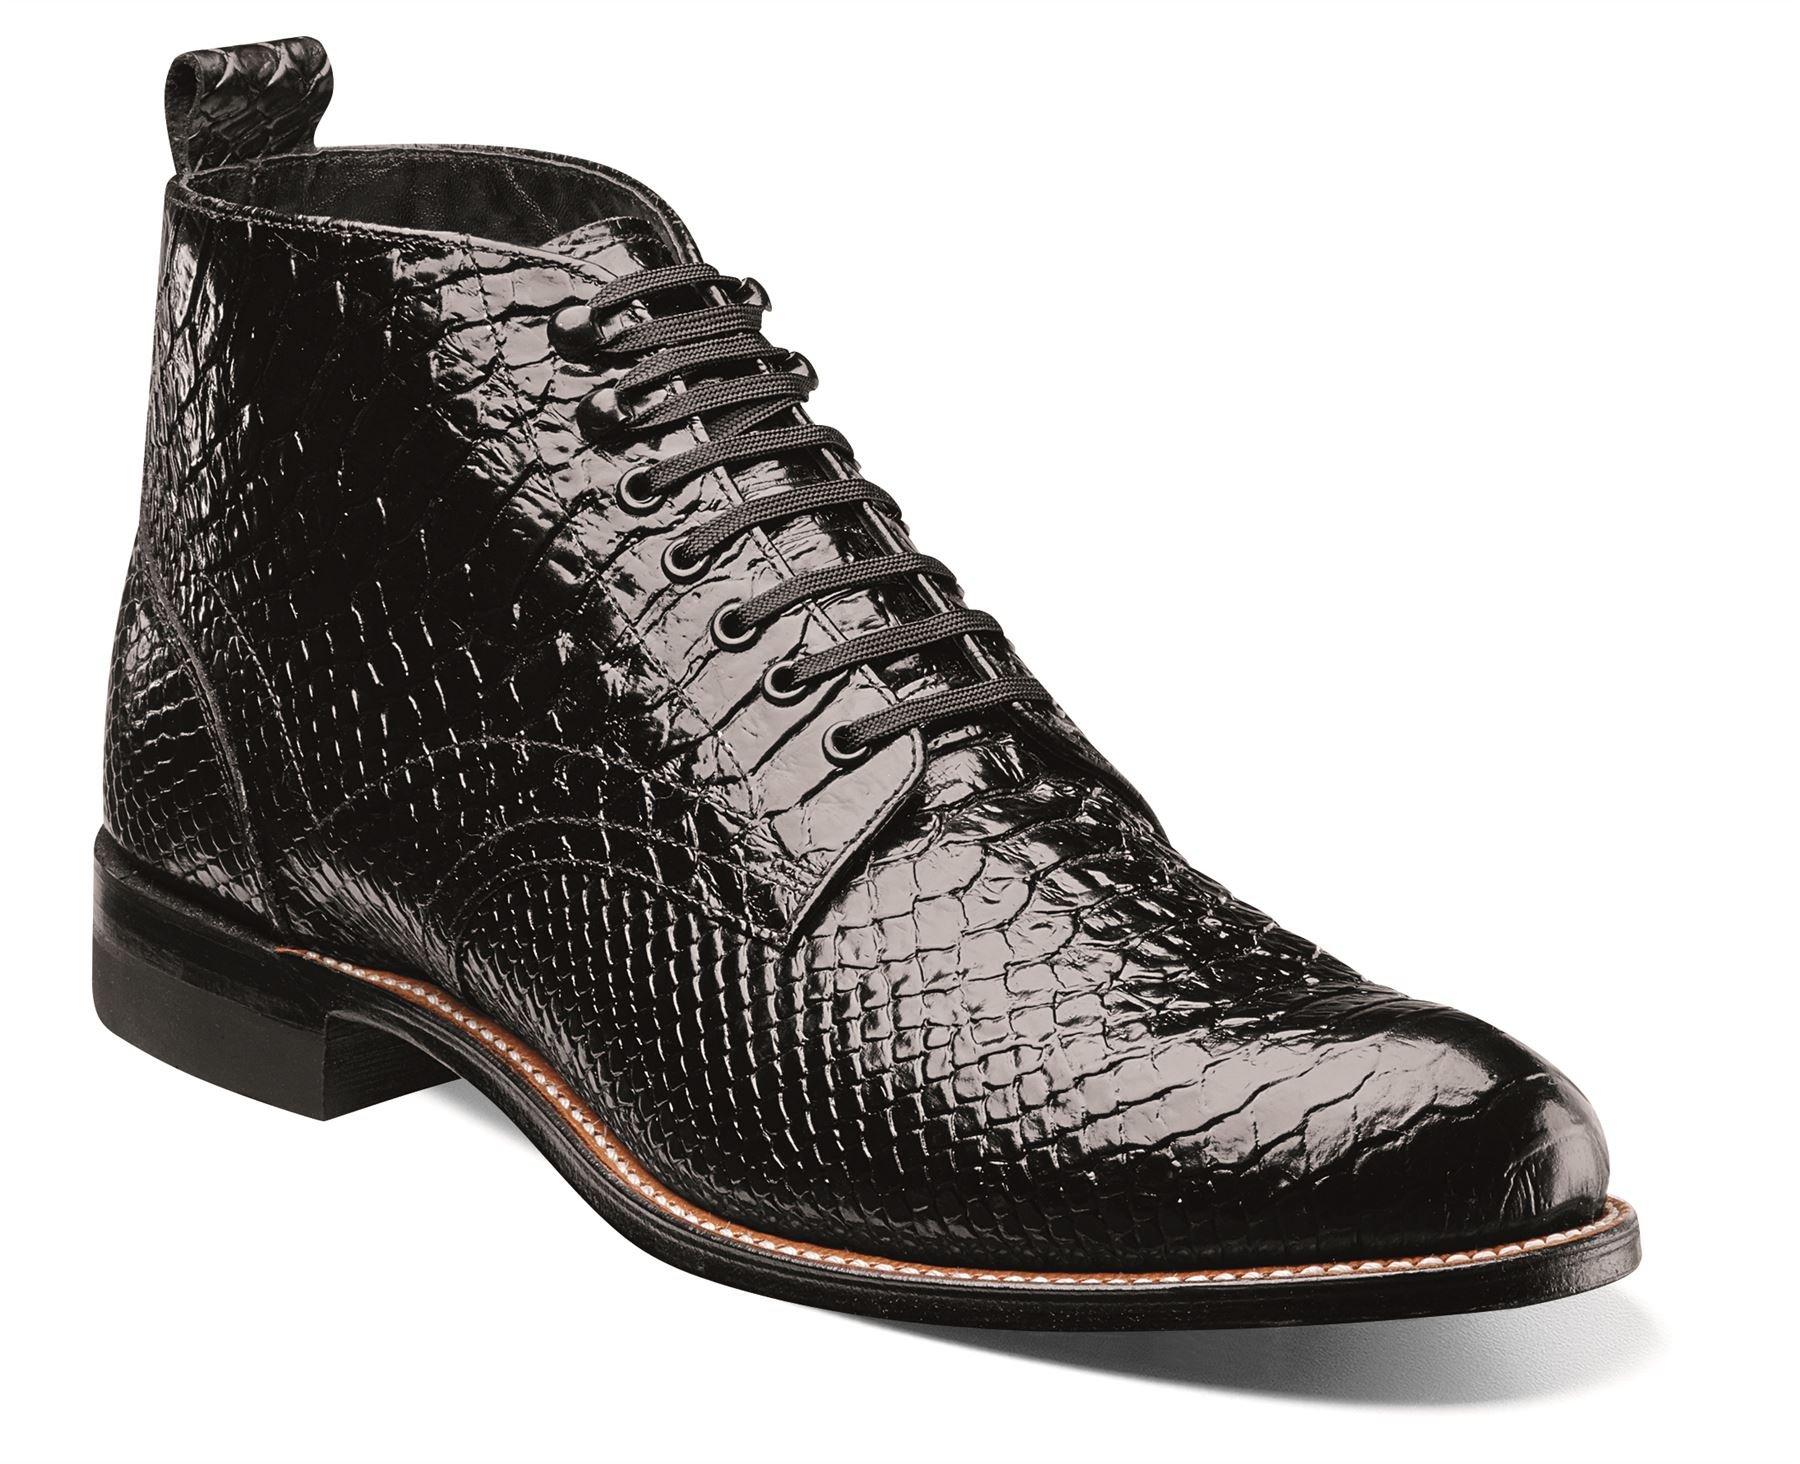 STACY ADAMS Madison HI Anaconda Men's Boot 14 D(M) US Black